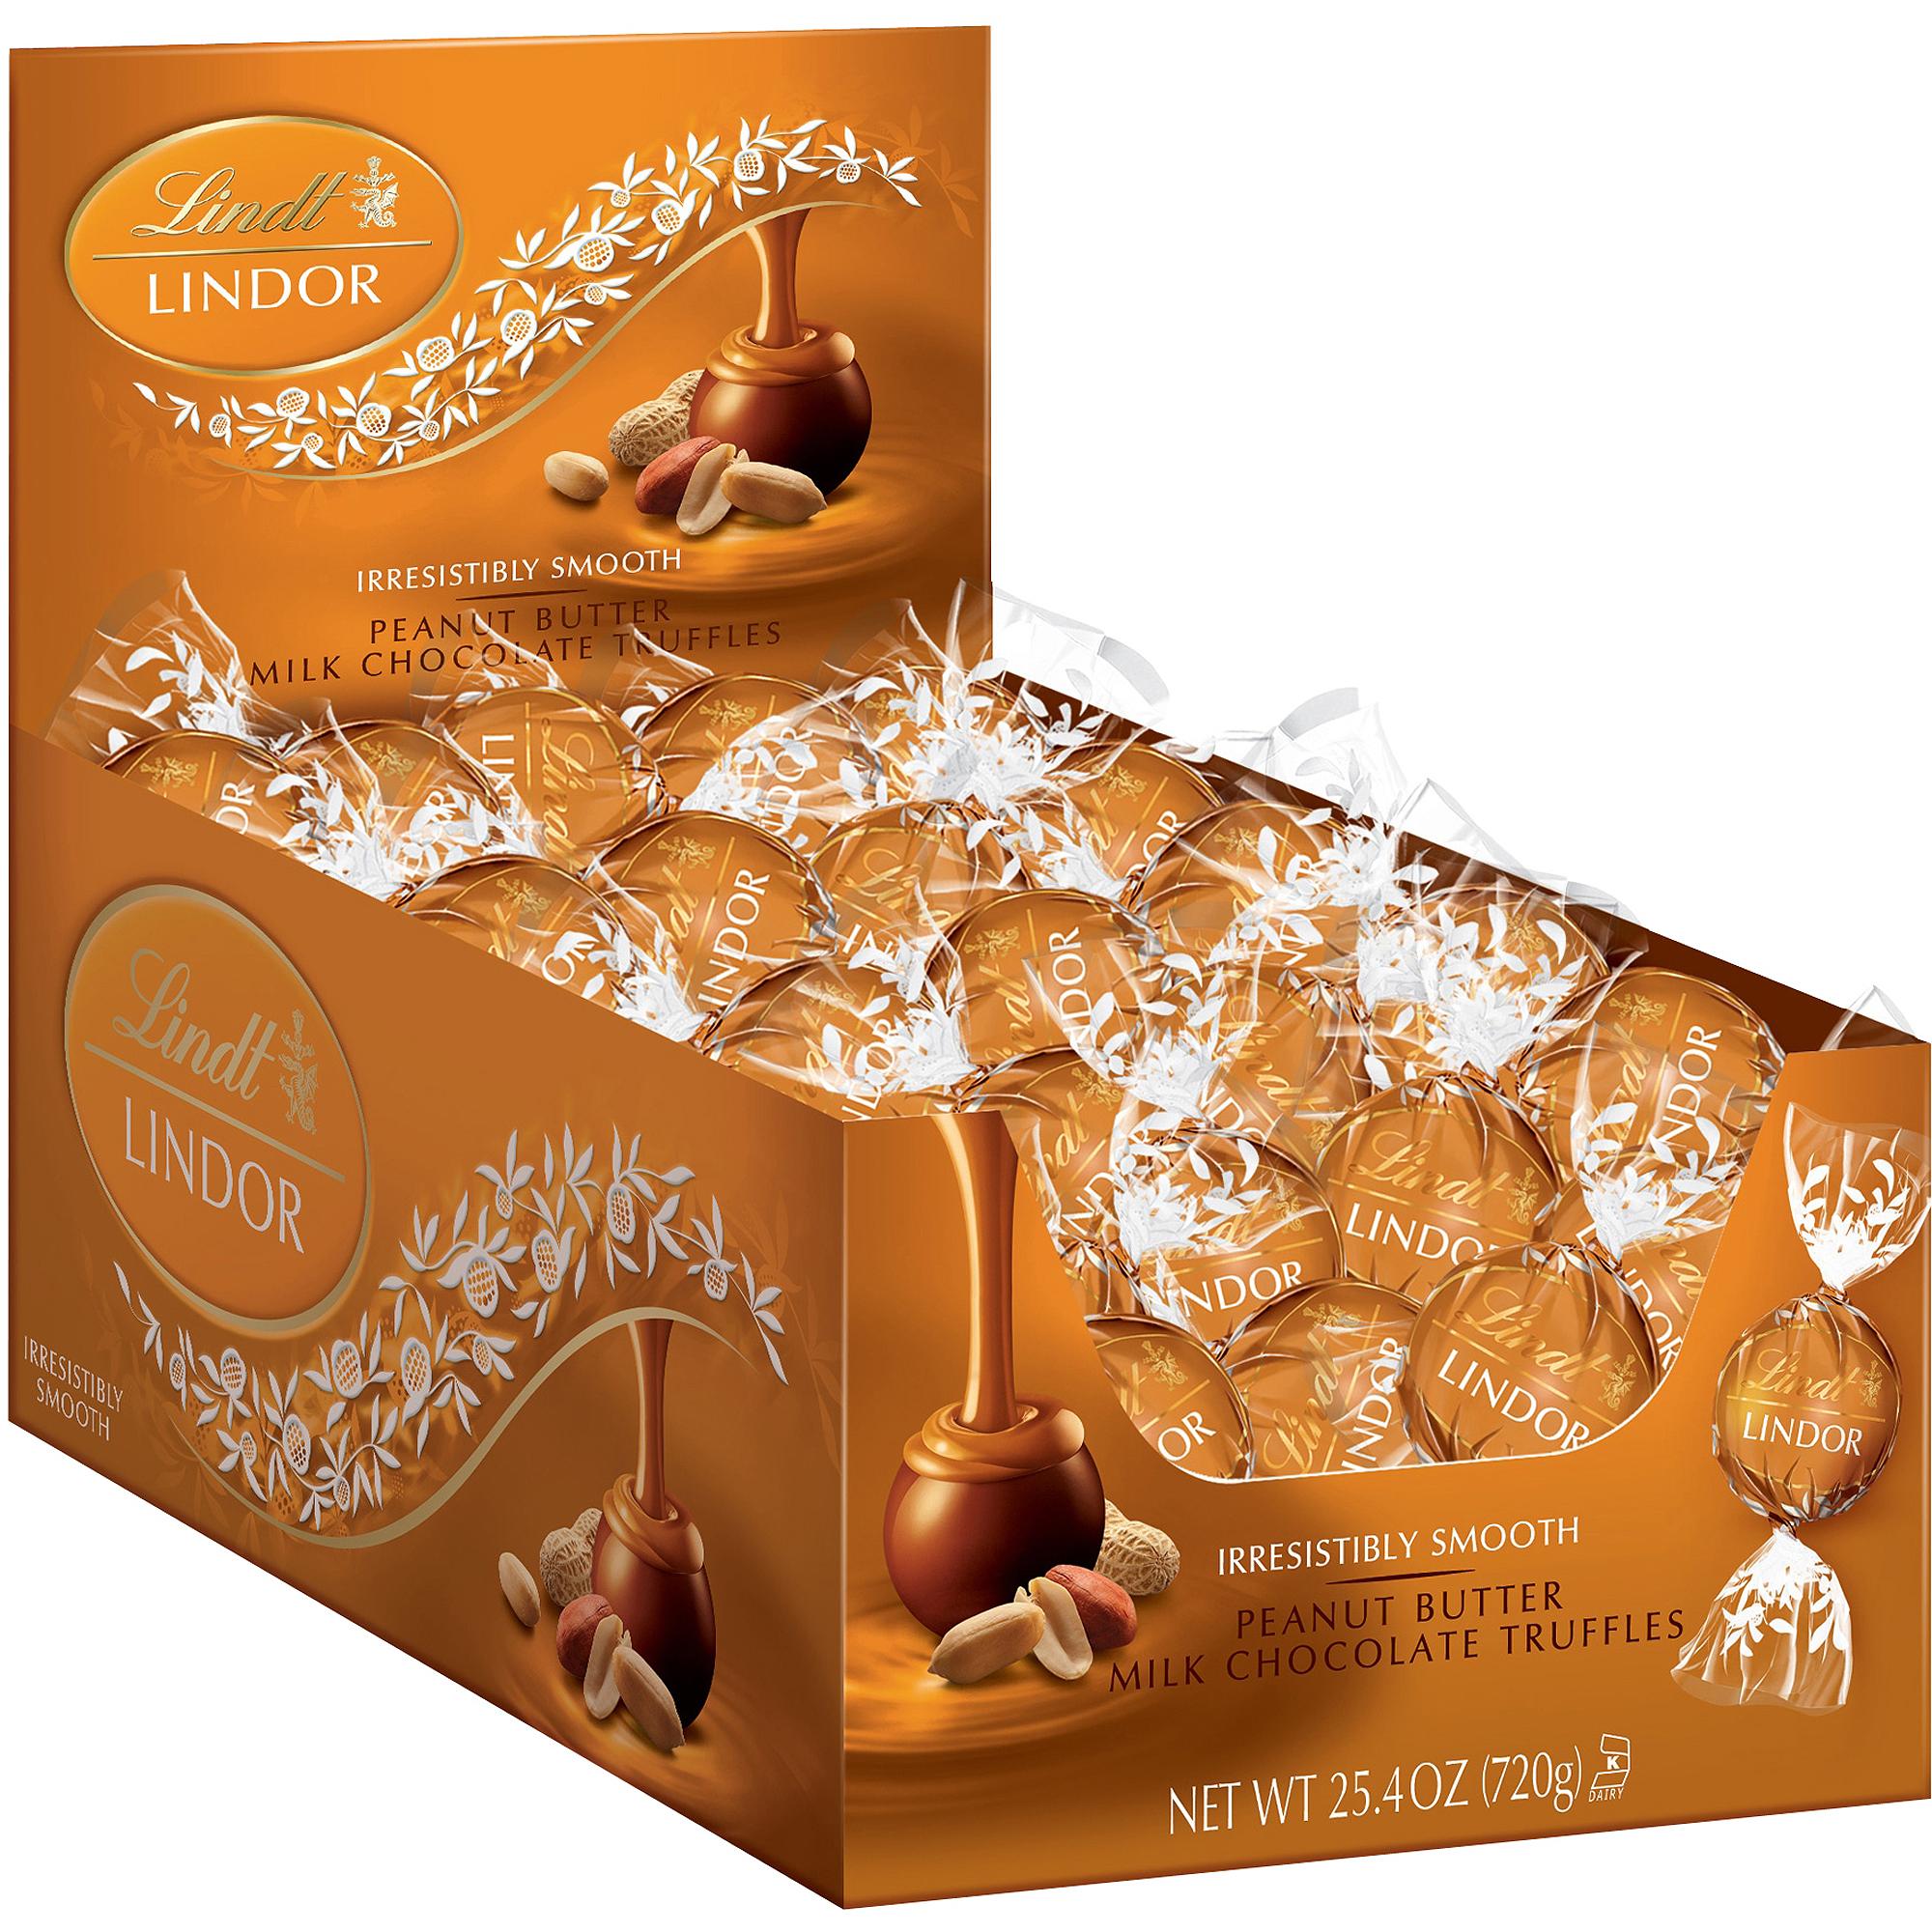 Lindor Peanut Butter Milk Chocolate Truffles, 25.4 oz